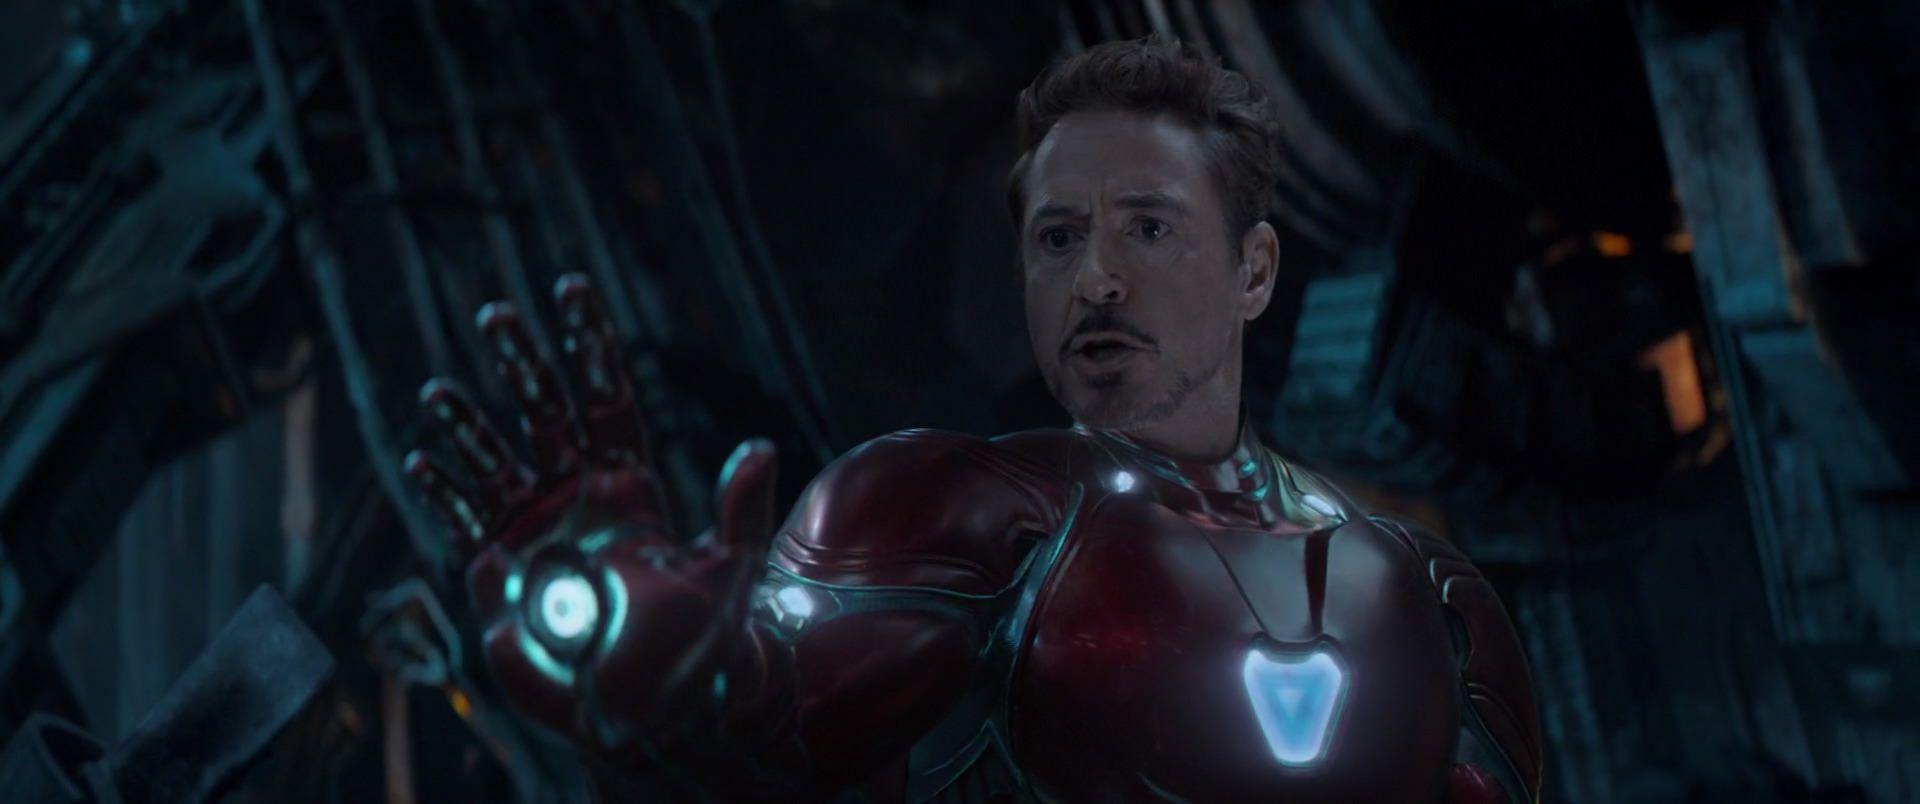 Avengers Infinity War Avengers Movies Avengers Avengers Infinity War